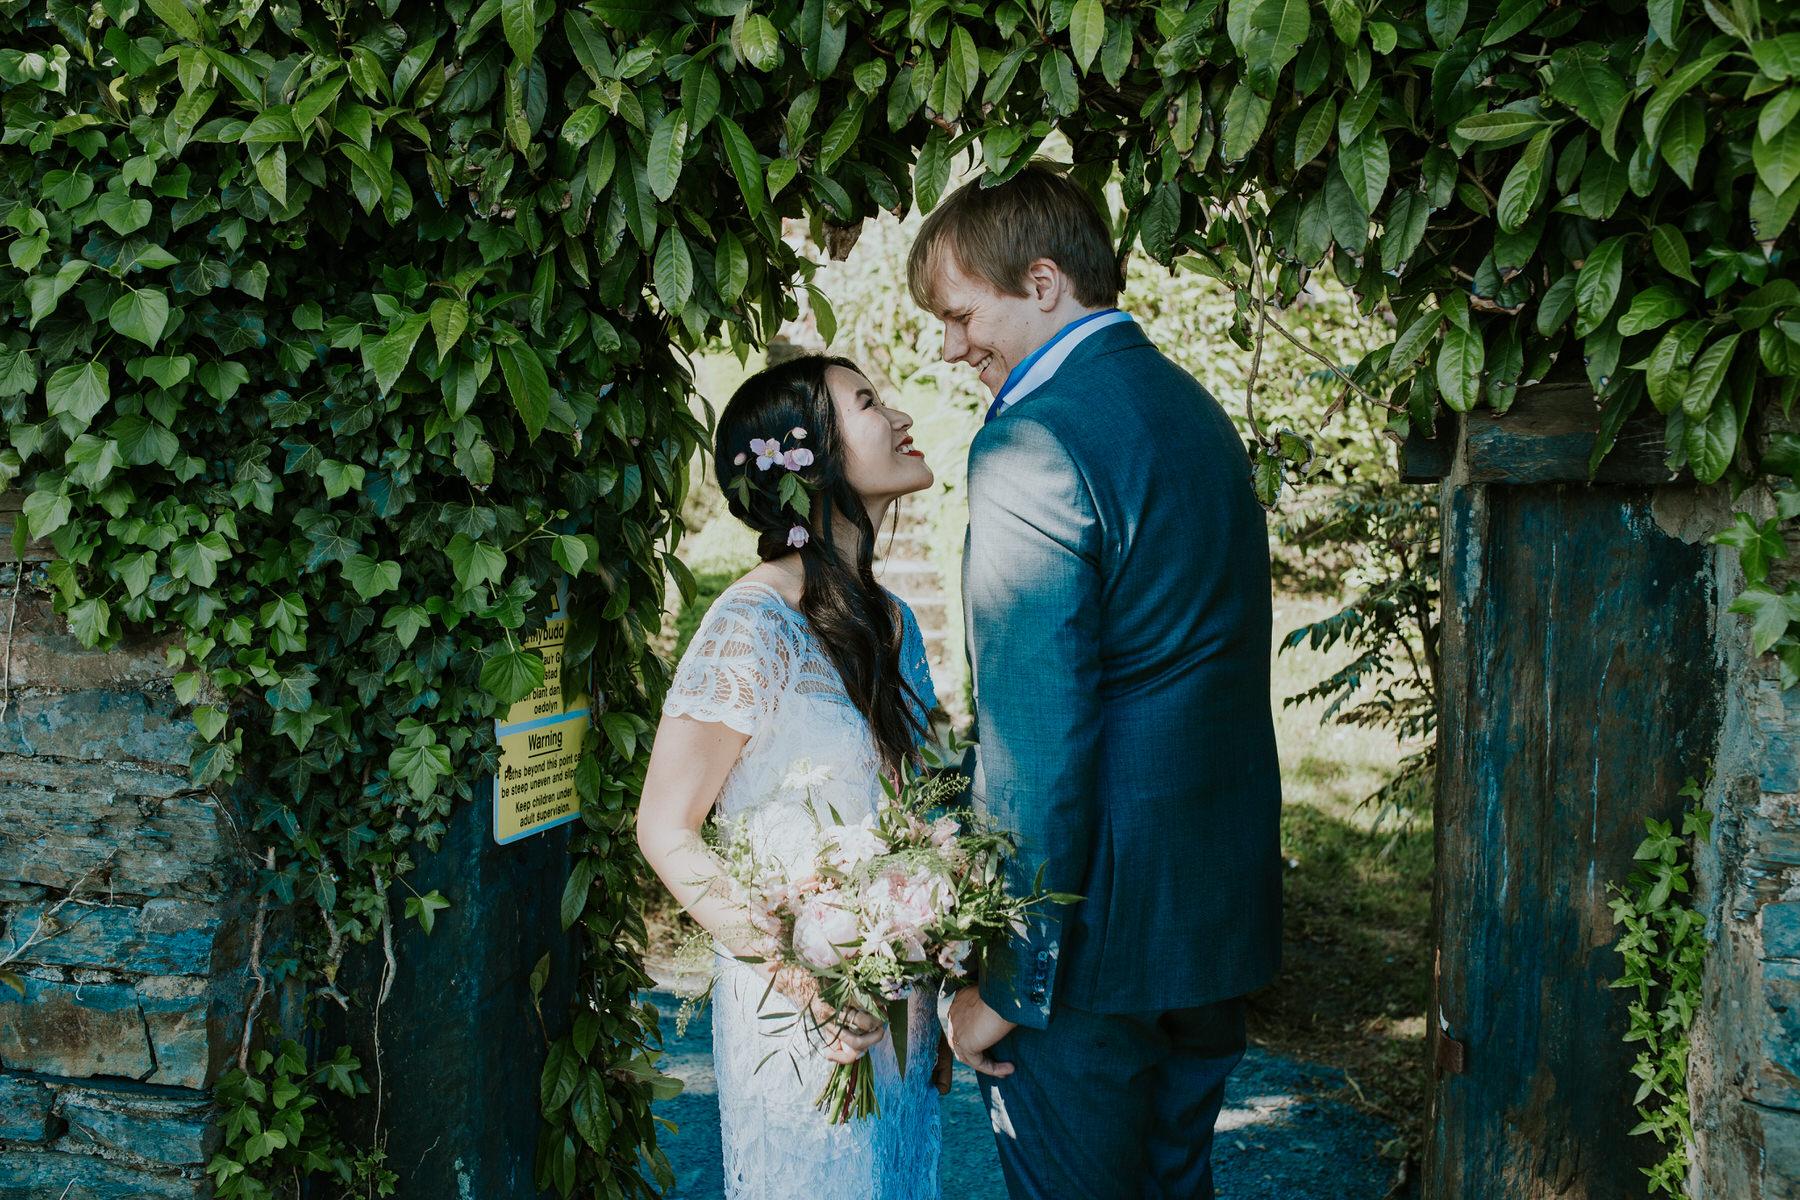 712 Portmeirion bride groom wedding portrait green arch.jpg